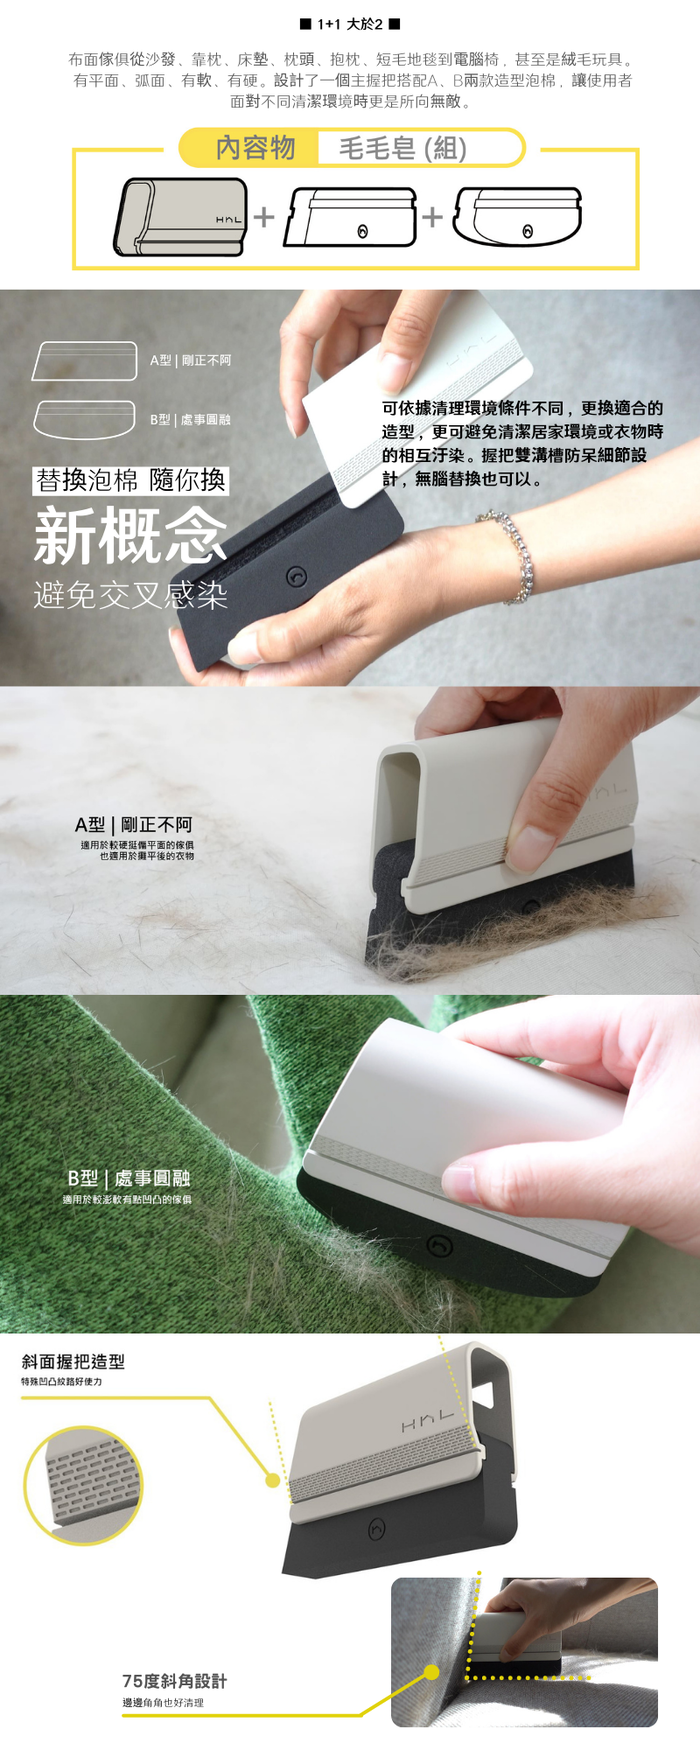 HhL Design   毛毛皂-布面除毛橡皮擦組(檸檬甜酒黃)